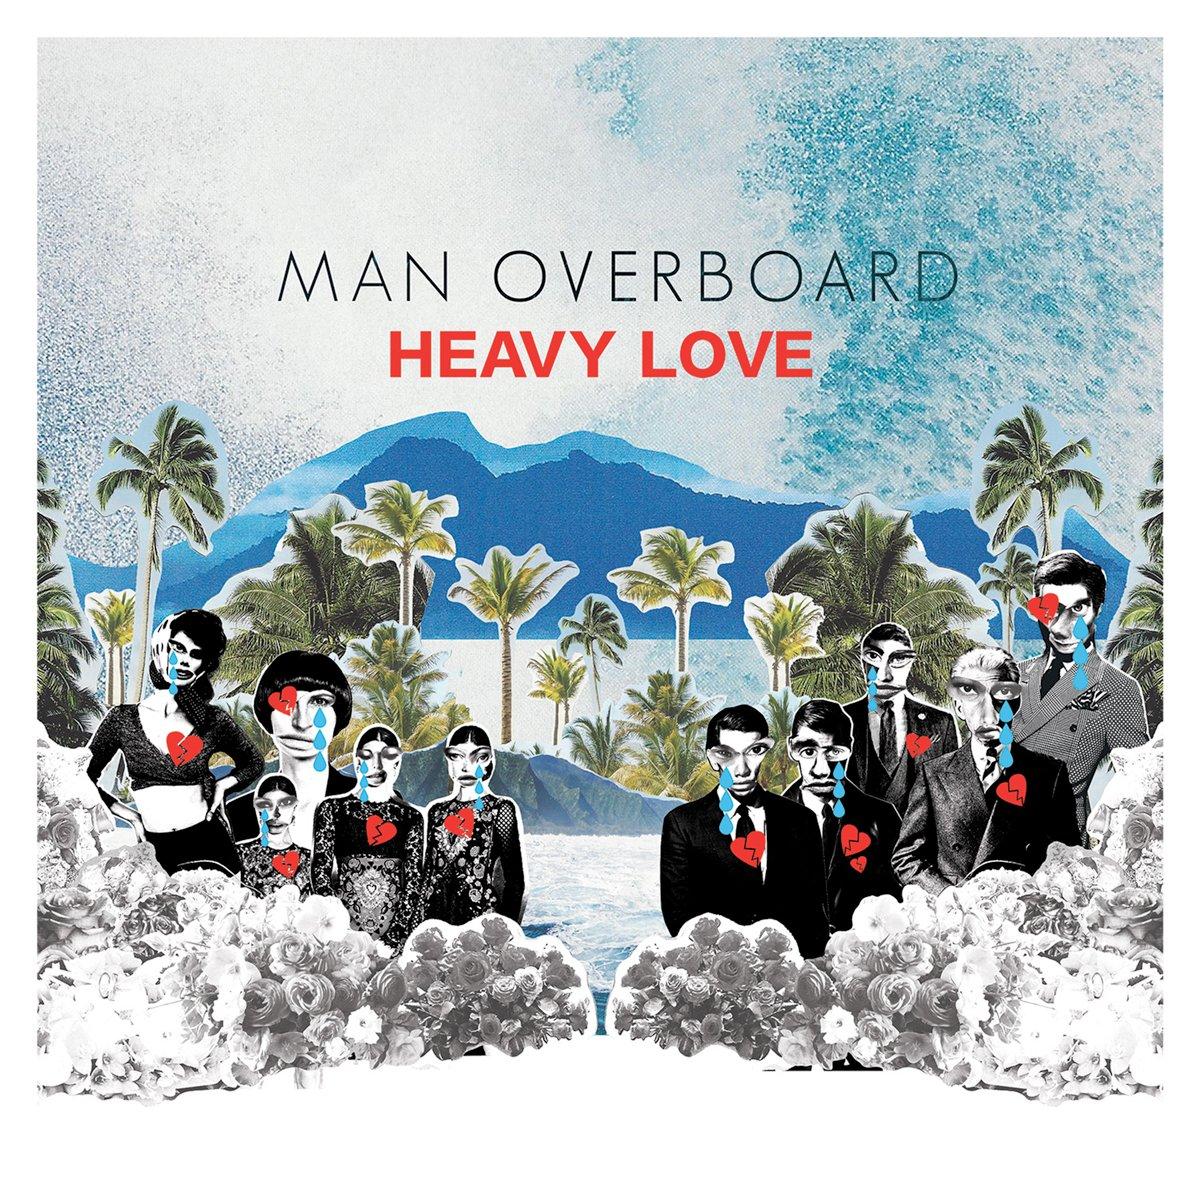 Man Overboard - Heavy Love